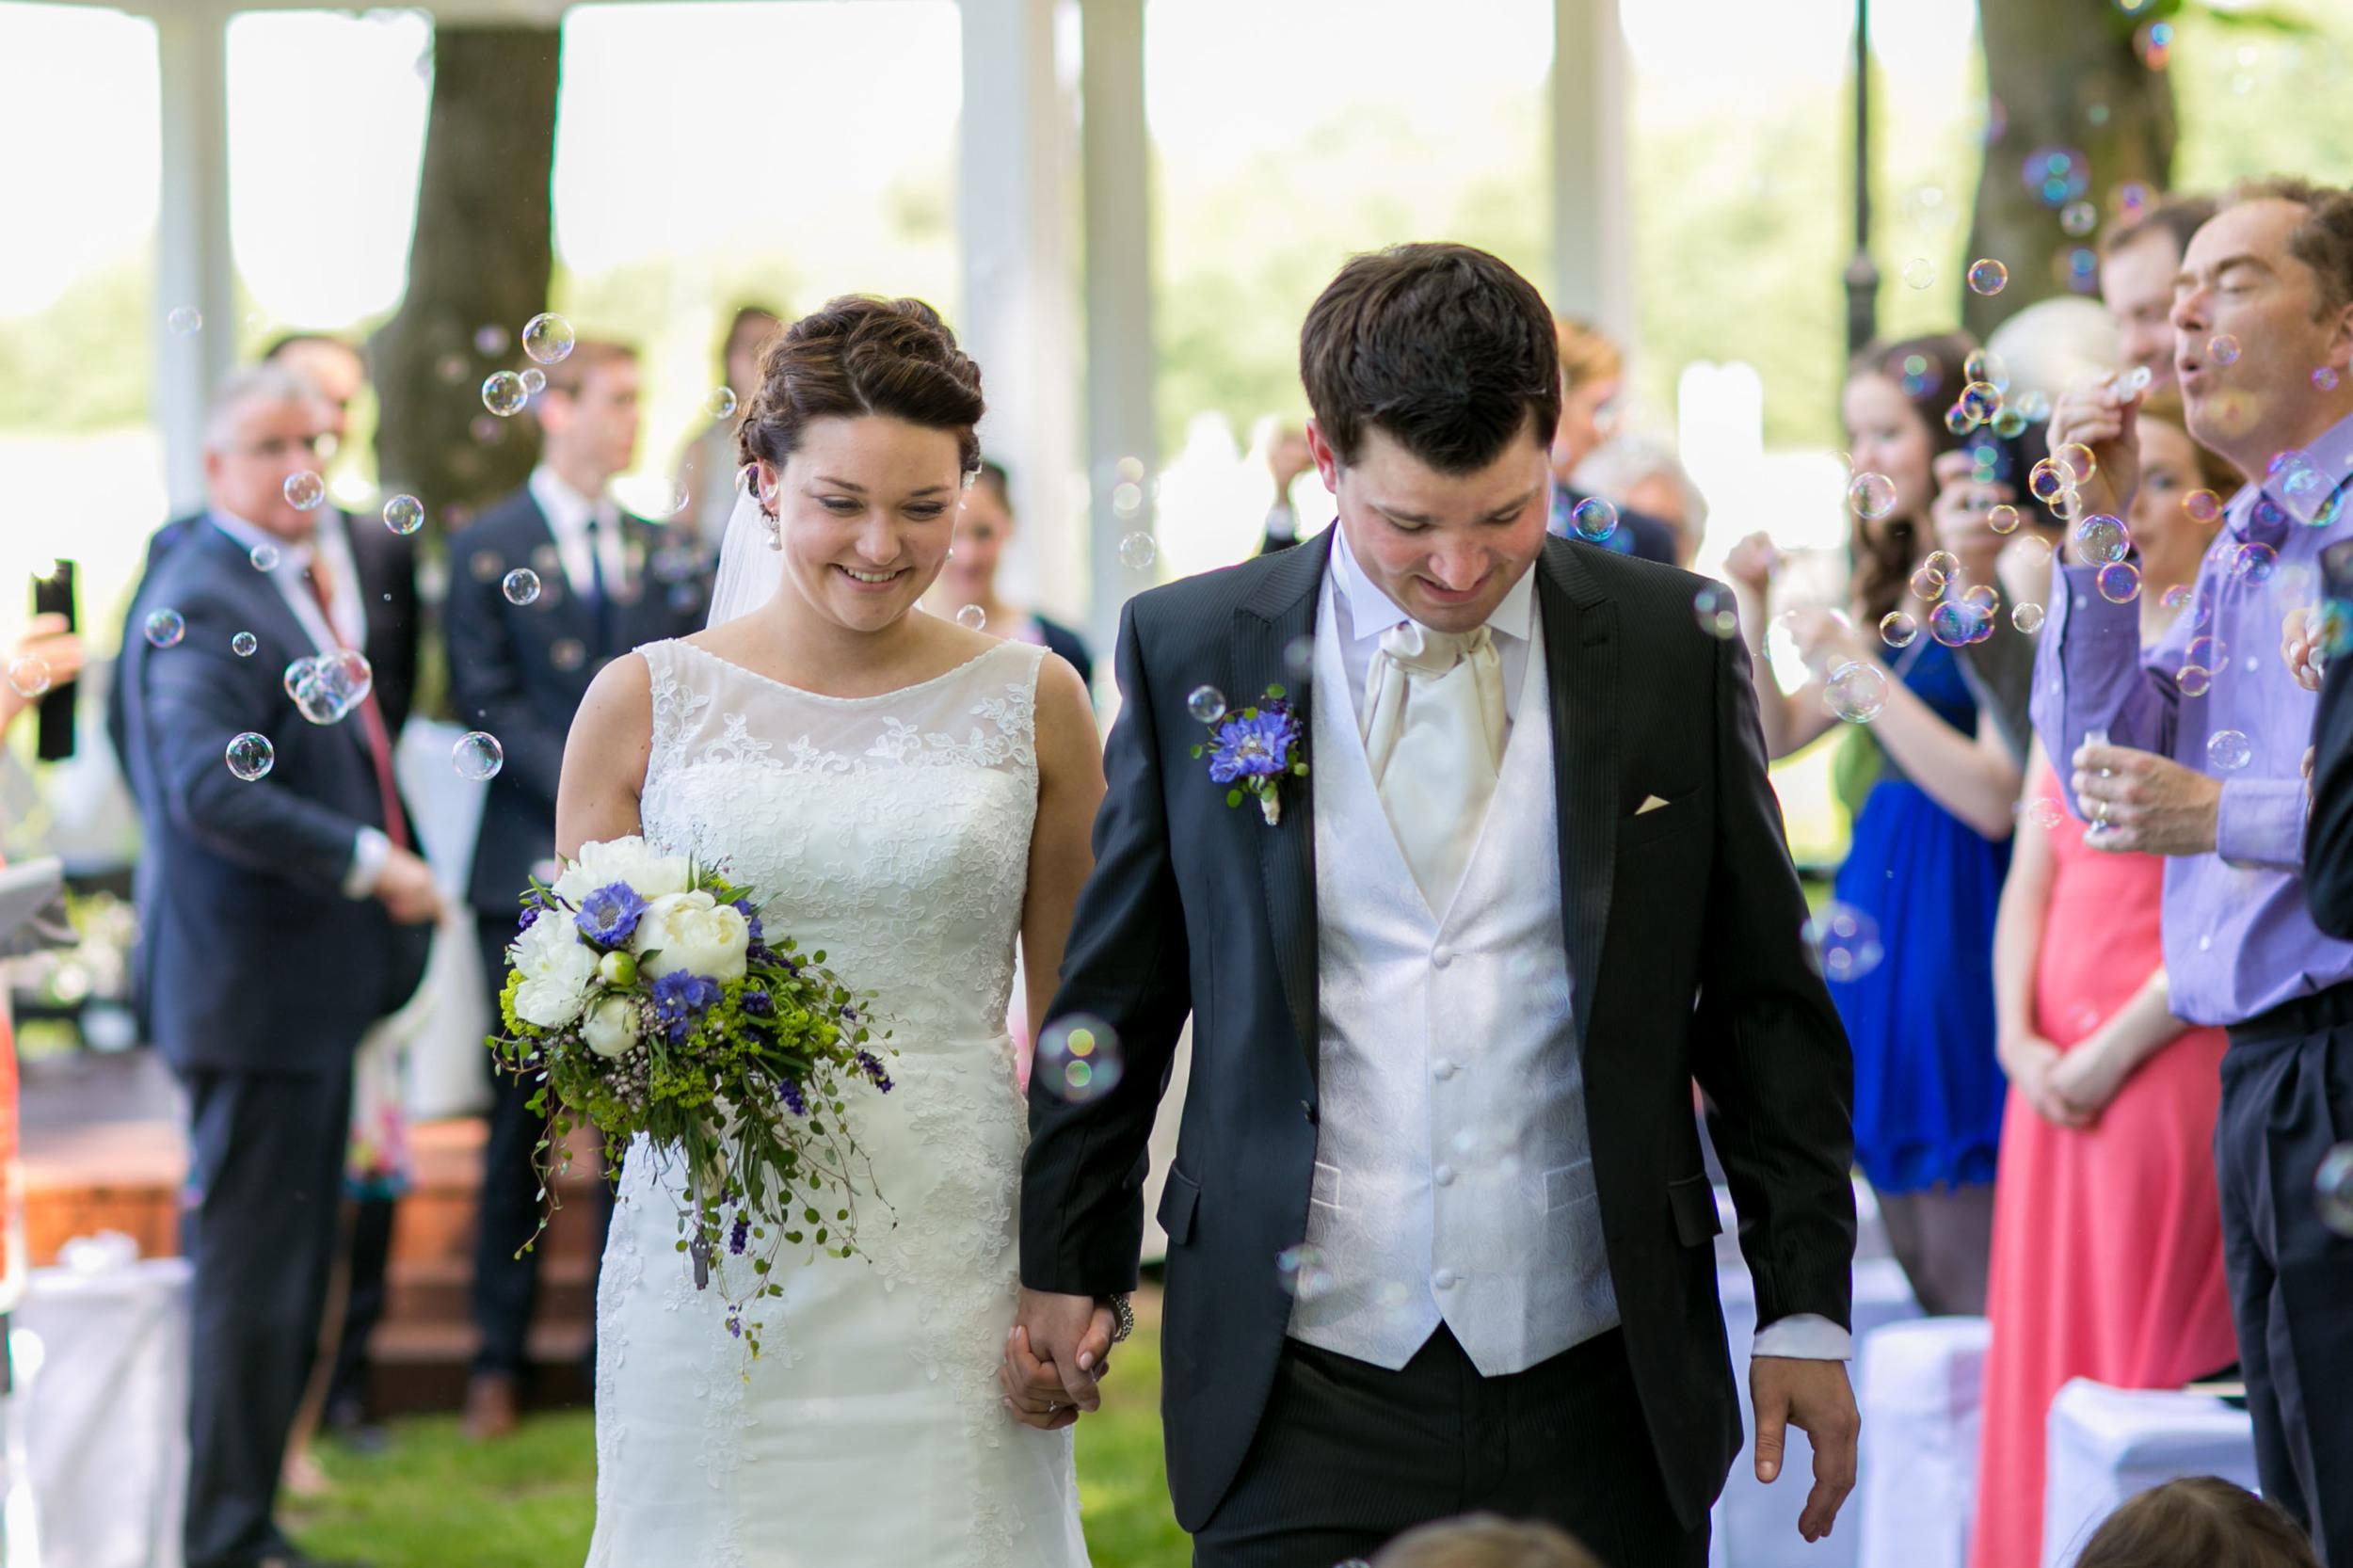 Hochzeitsfotografie Berlin_Fran Burrows Fotografie-21.jpg